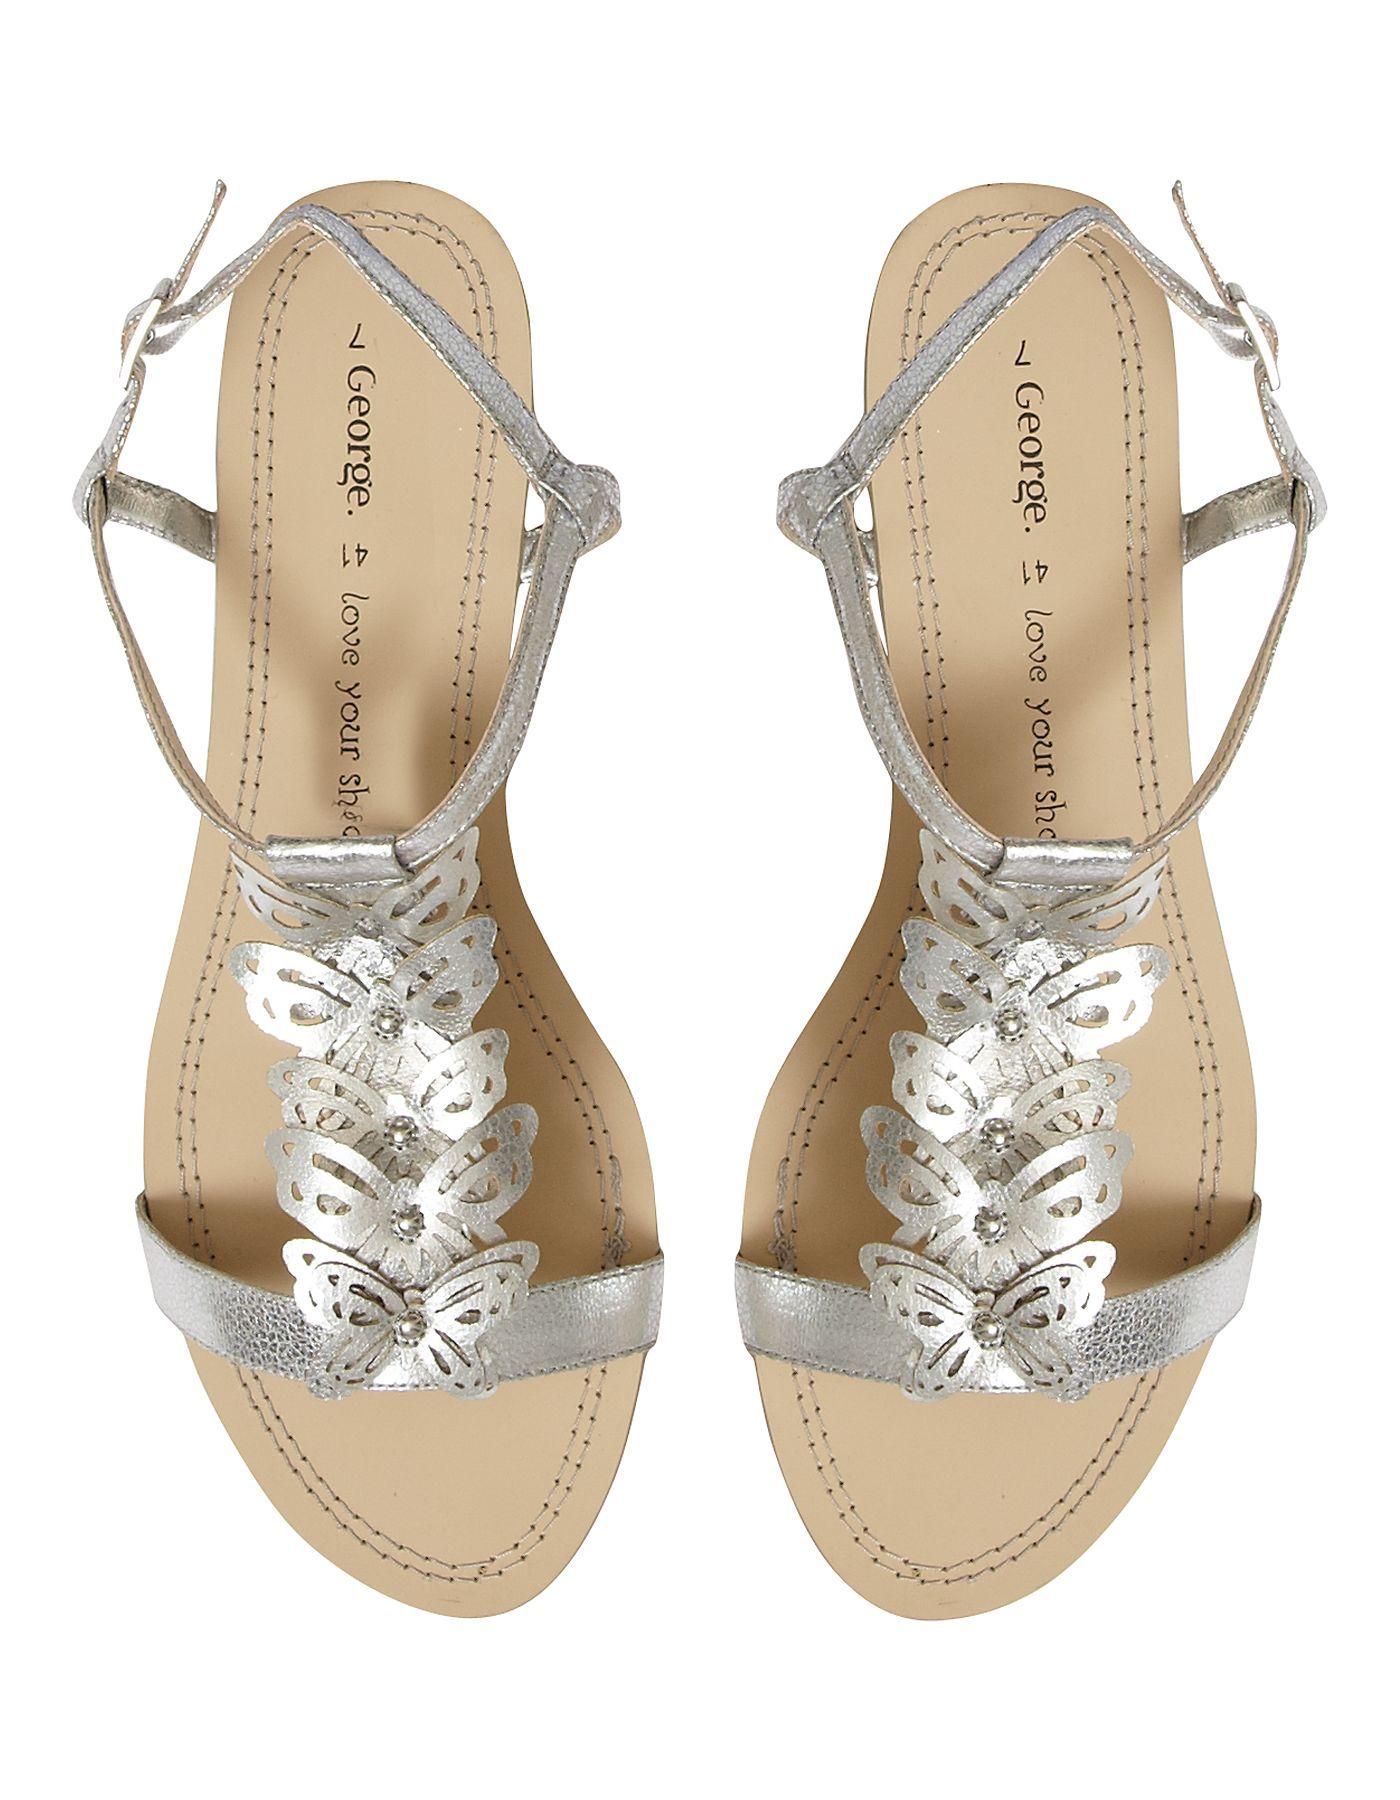 Butterfly Trim Sandals - Metallic